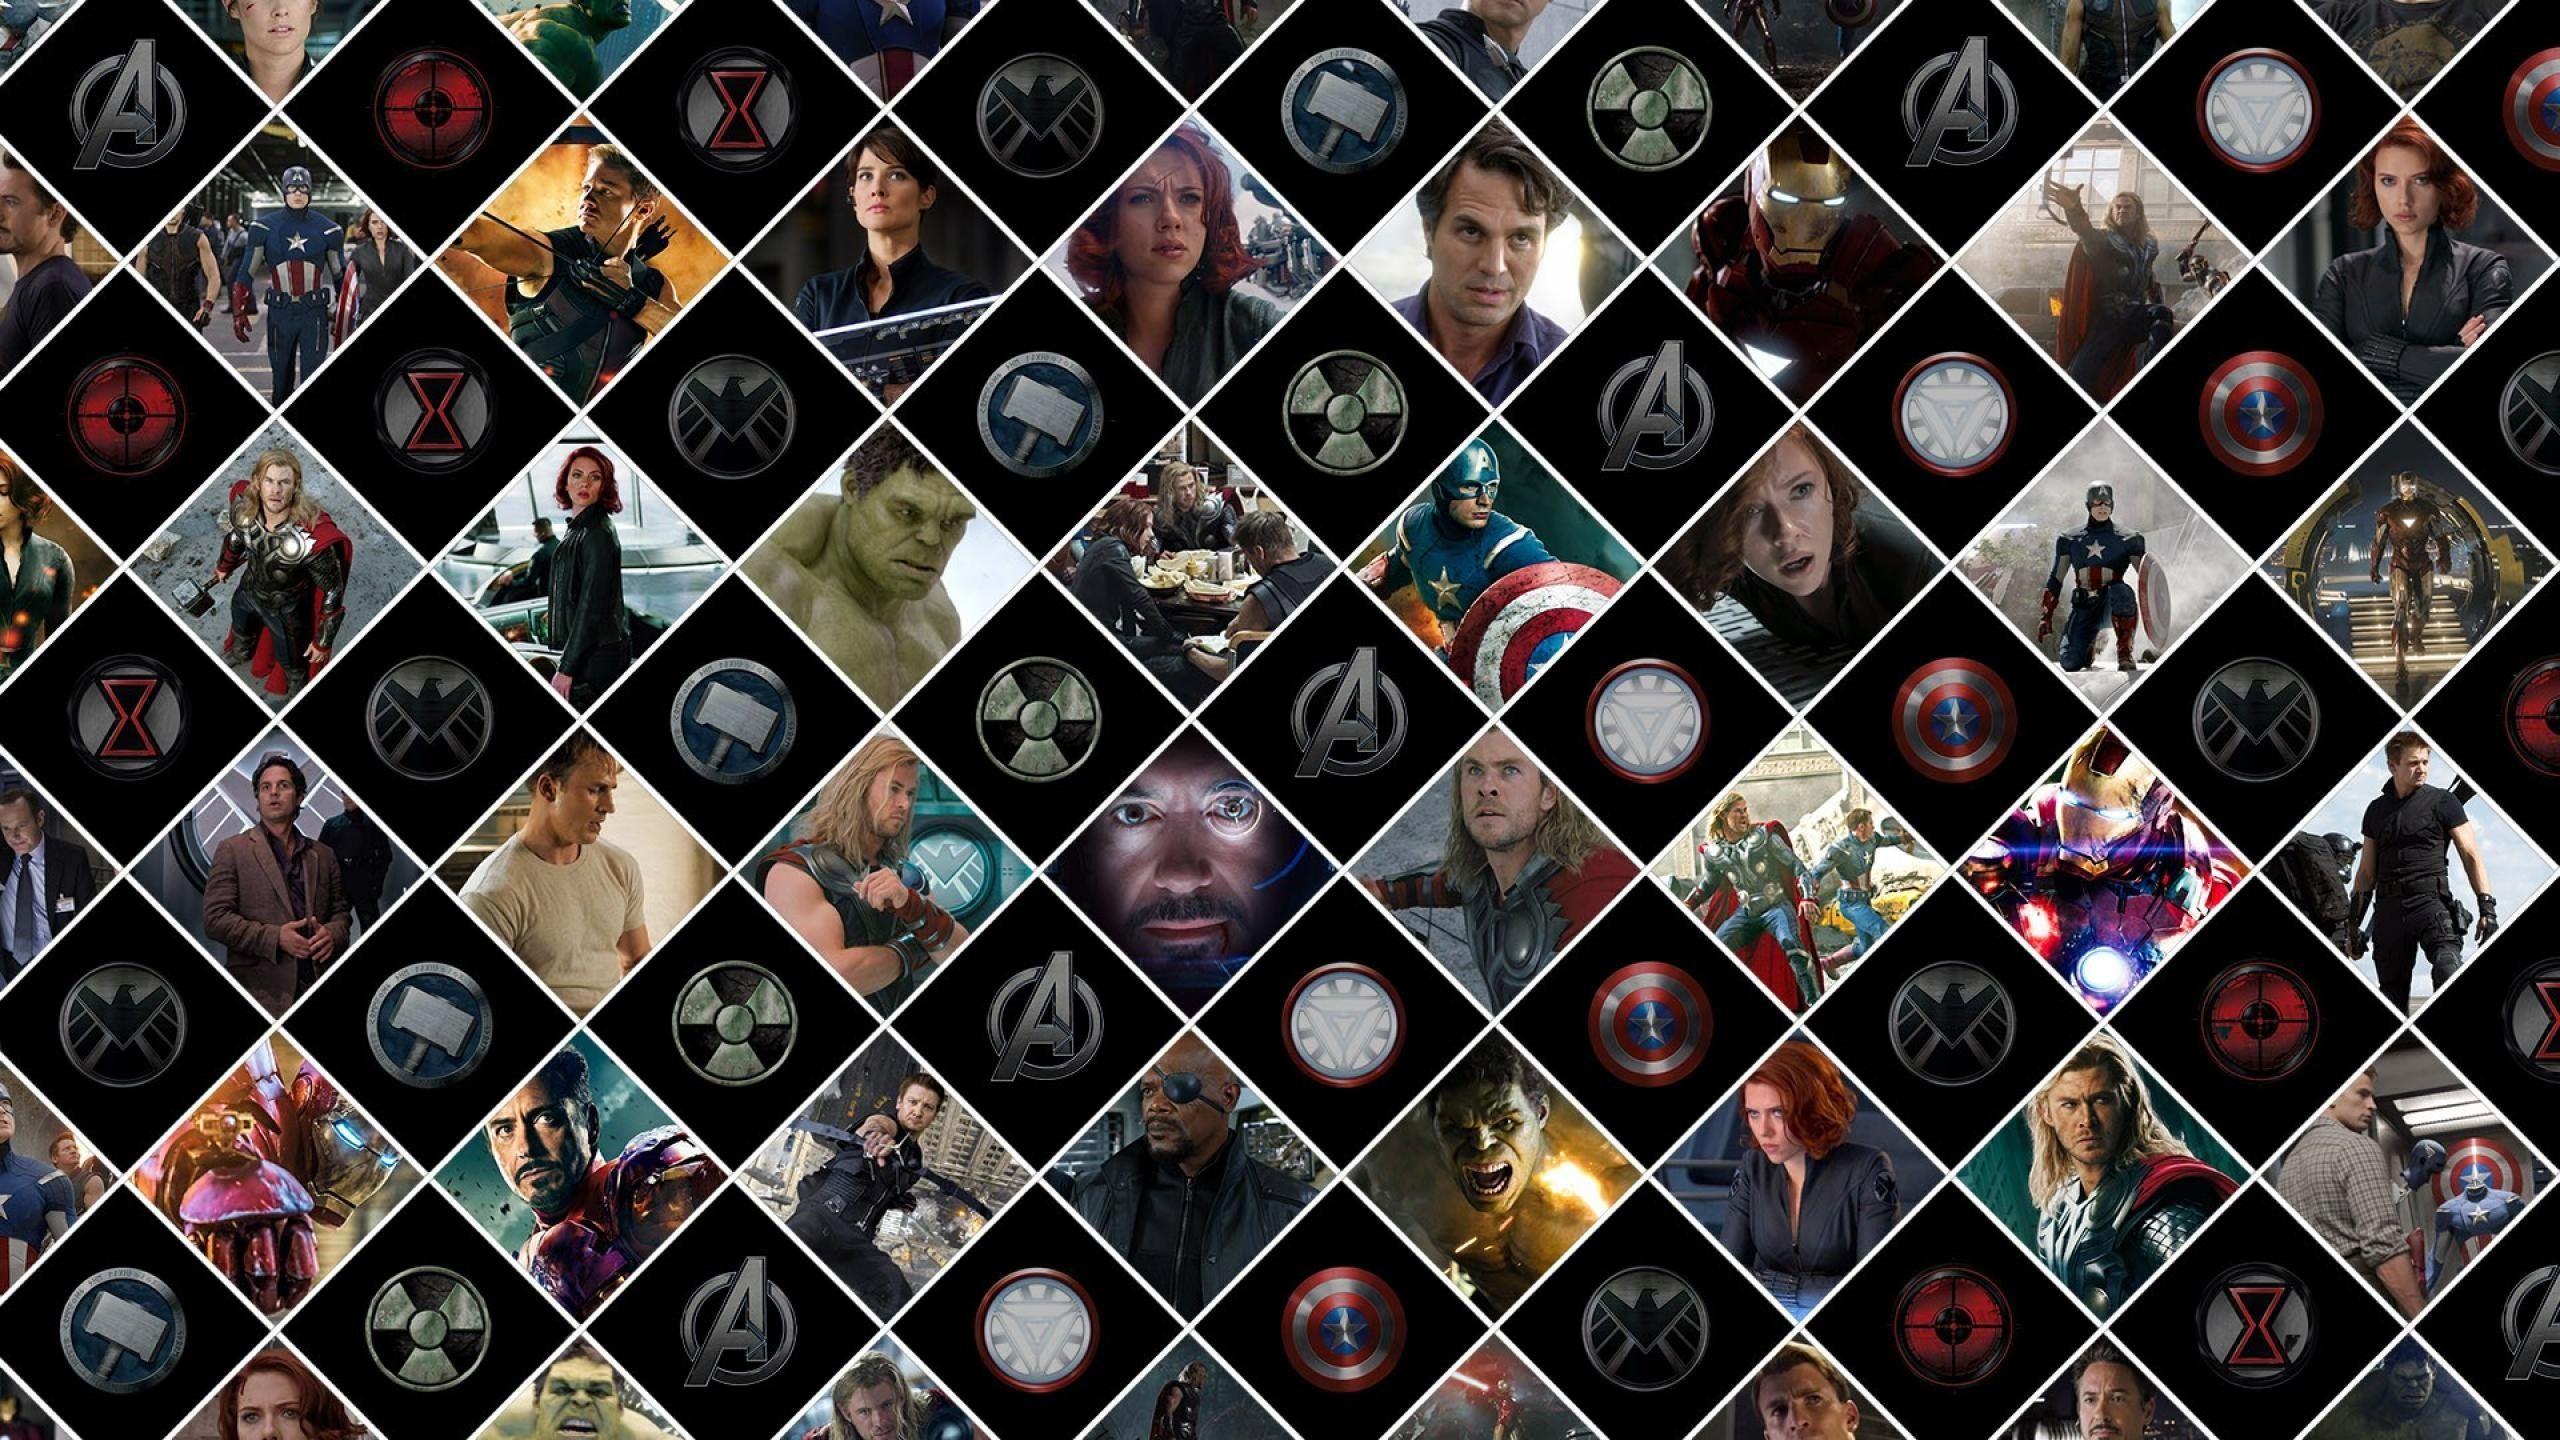 marvel avengers age of ultron wallpaper activities marvel 750×861